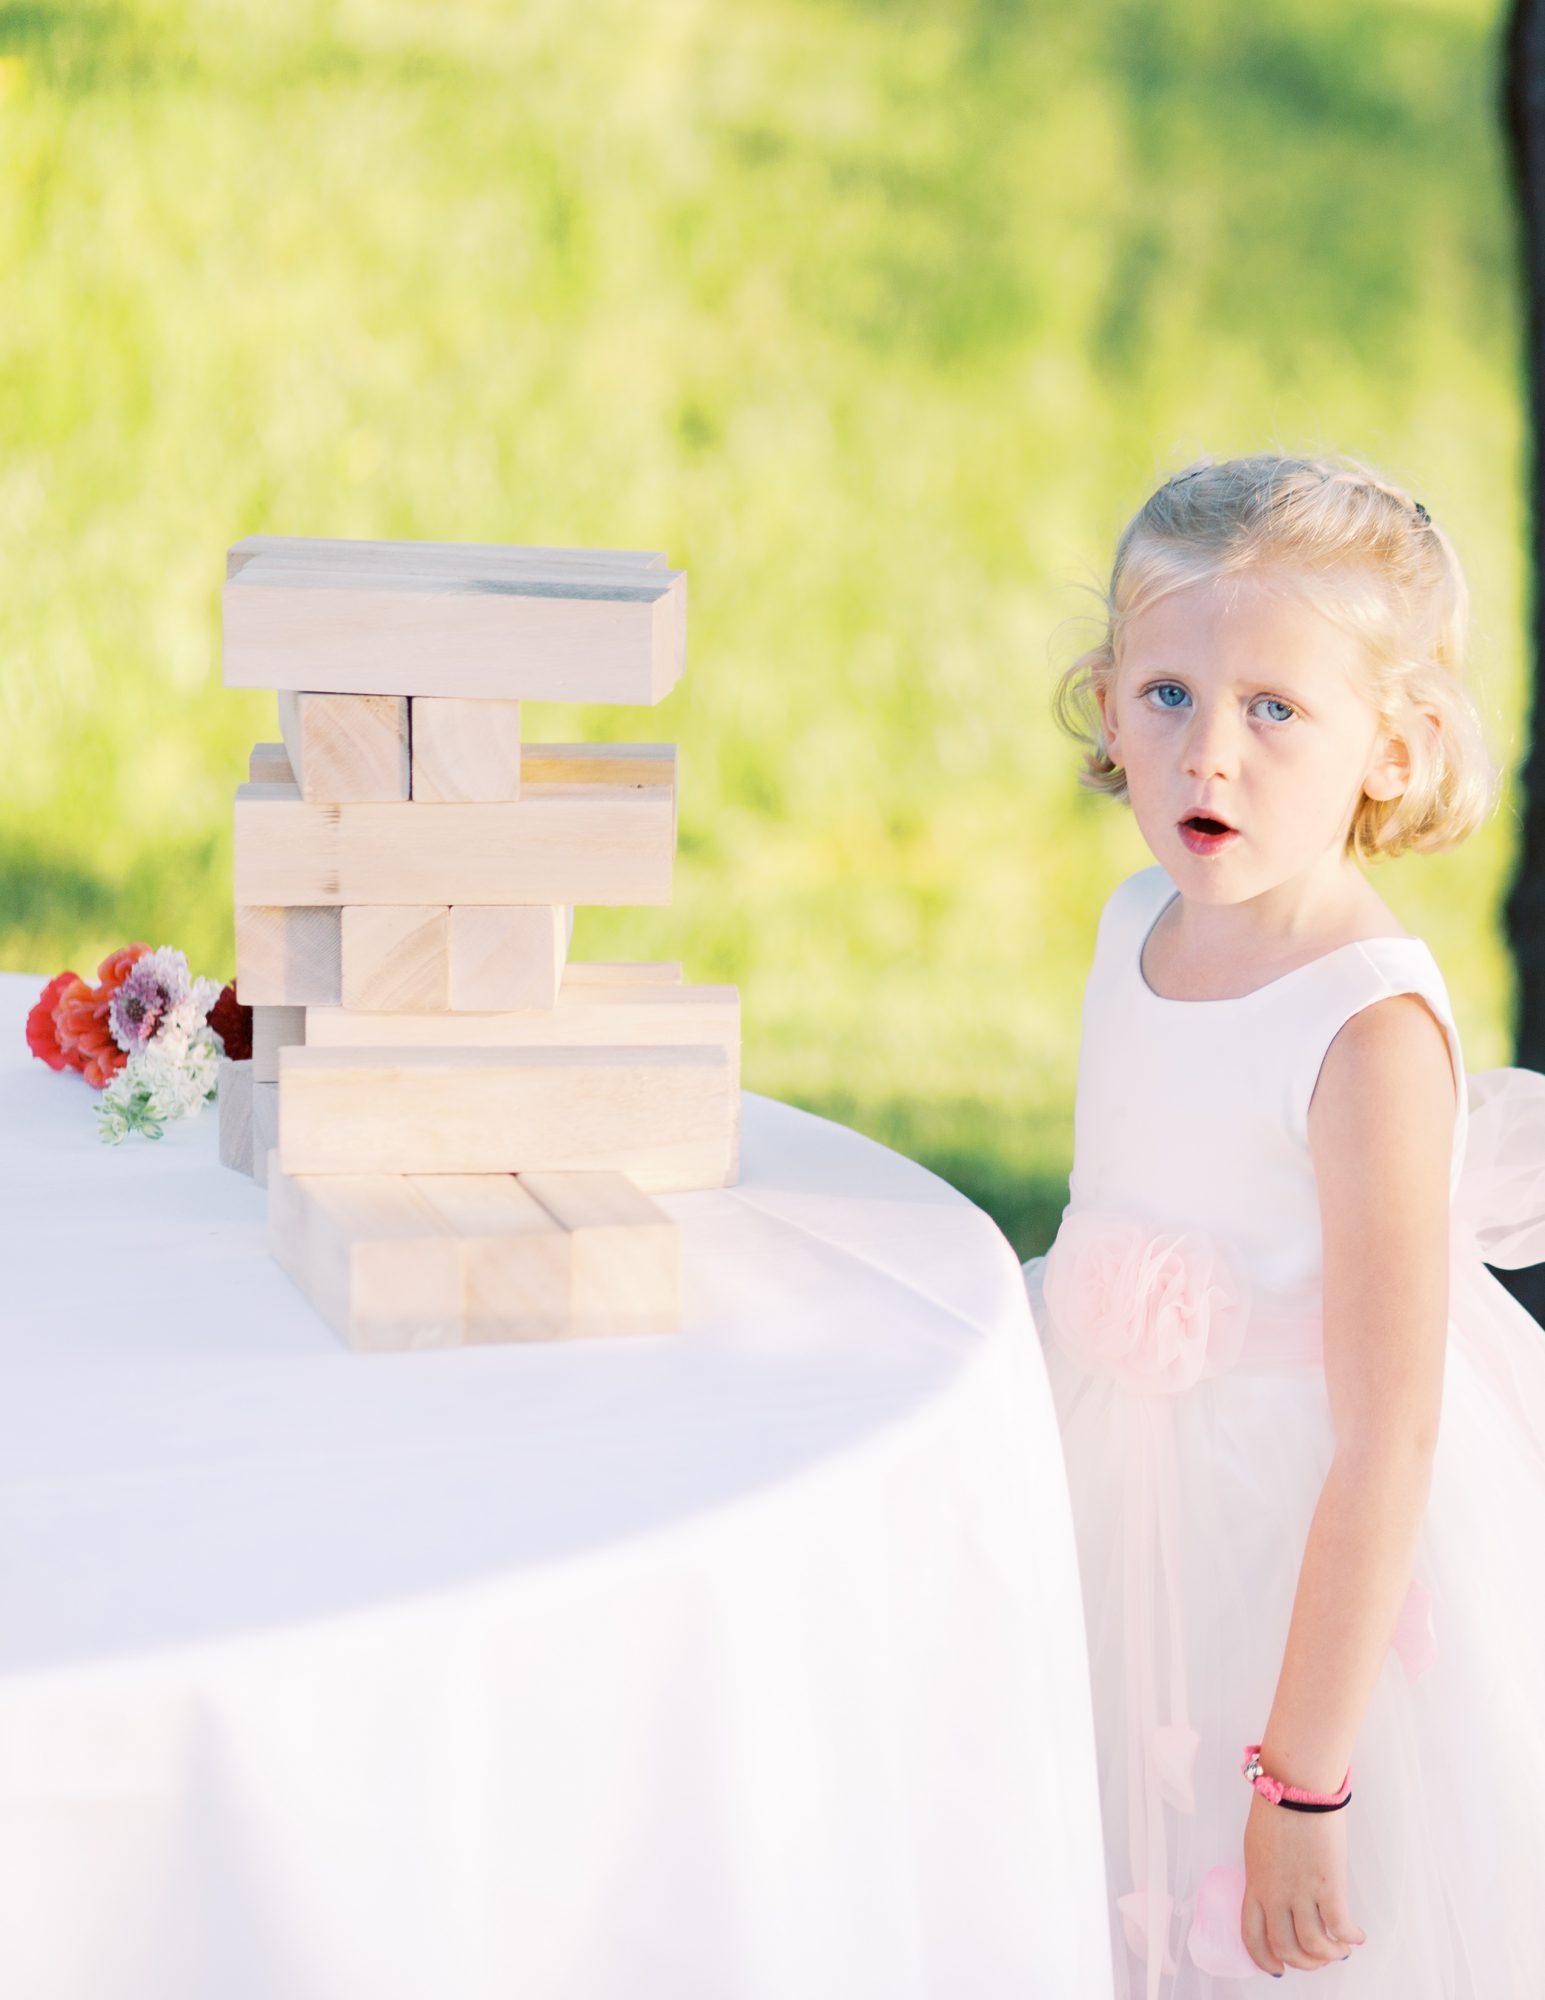 charlene jeremy wedding reception outdoor games